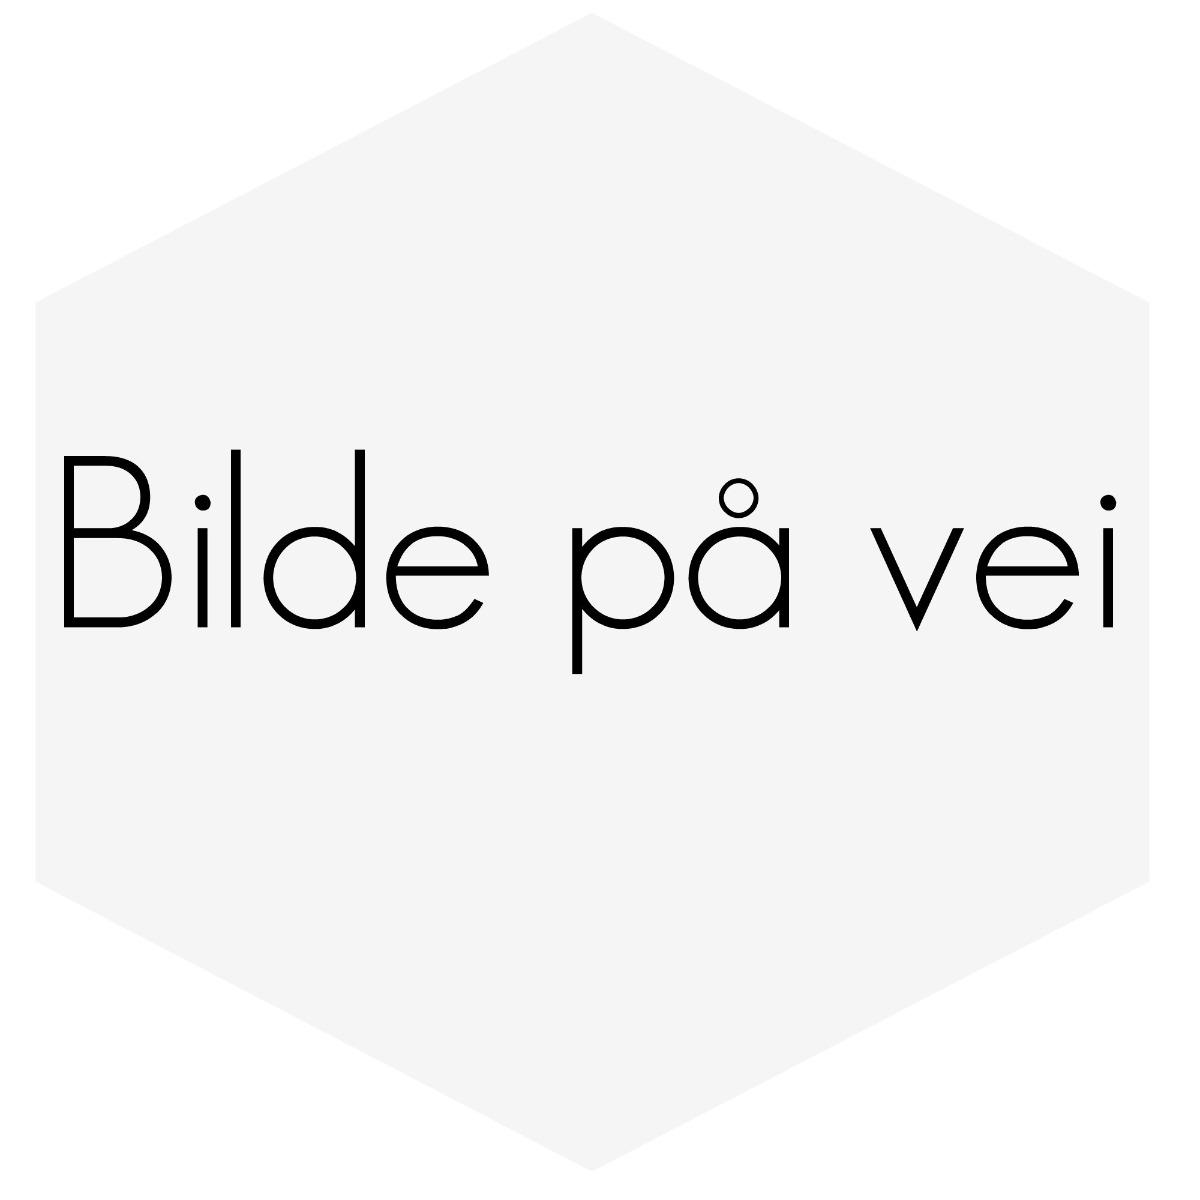 STØTDEMPER BAK NIVÅMAT til VOLVO XC90-03>14-30683451 Pris st